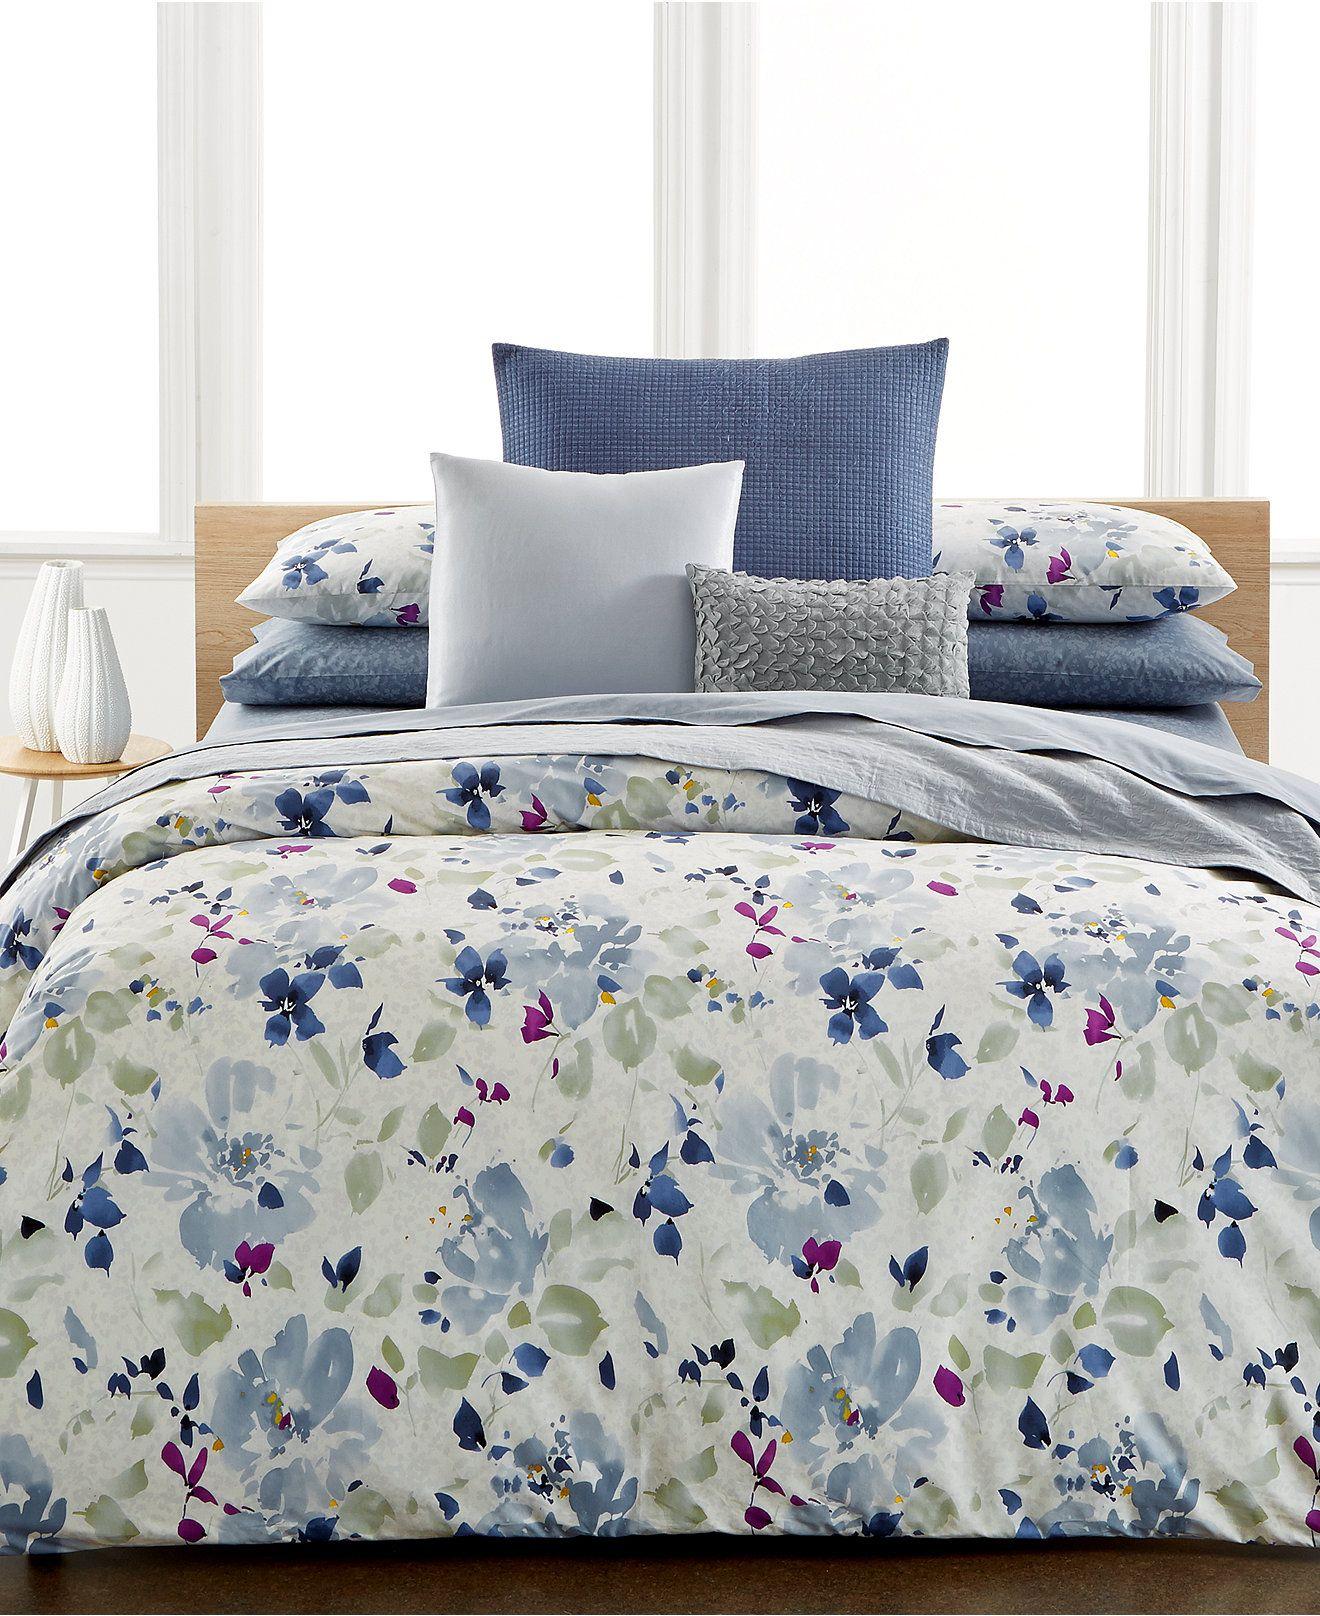 calvin klein watercolor peonies duvet covers - Comforter Covers